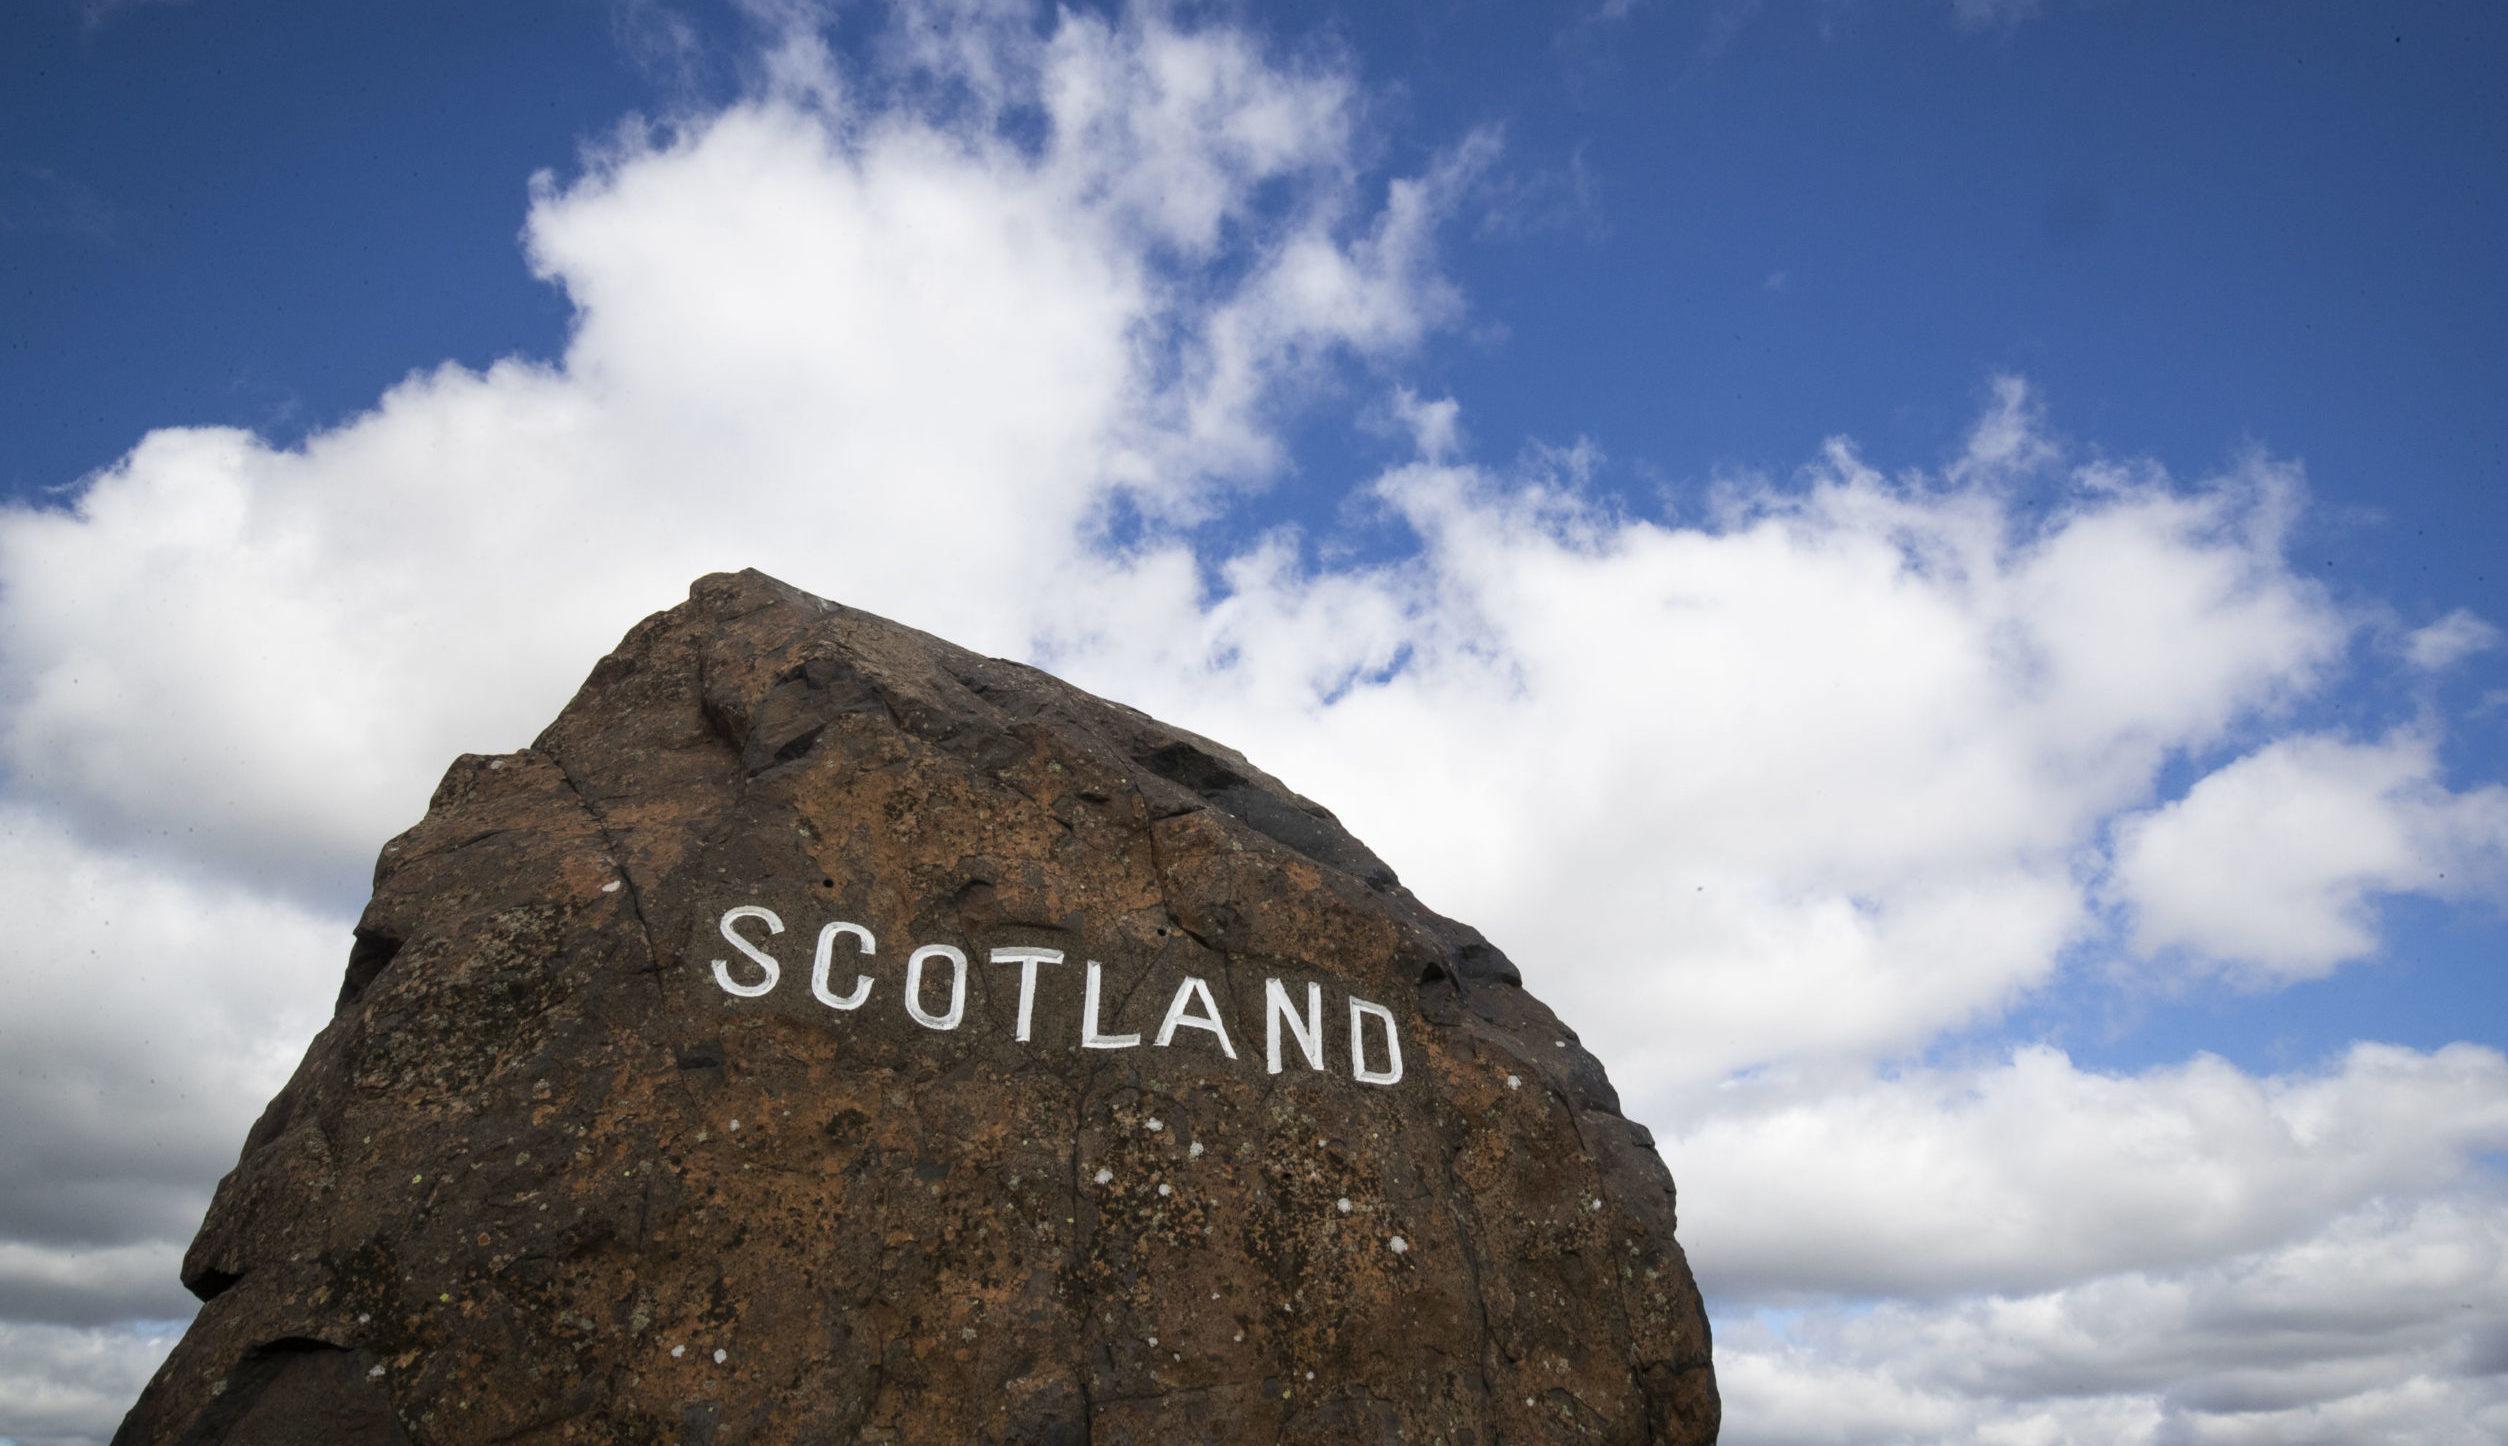 The Scotland-England border on the A68 near Jedburgh in the Scottish Borders.